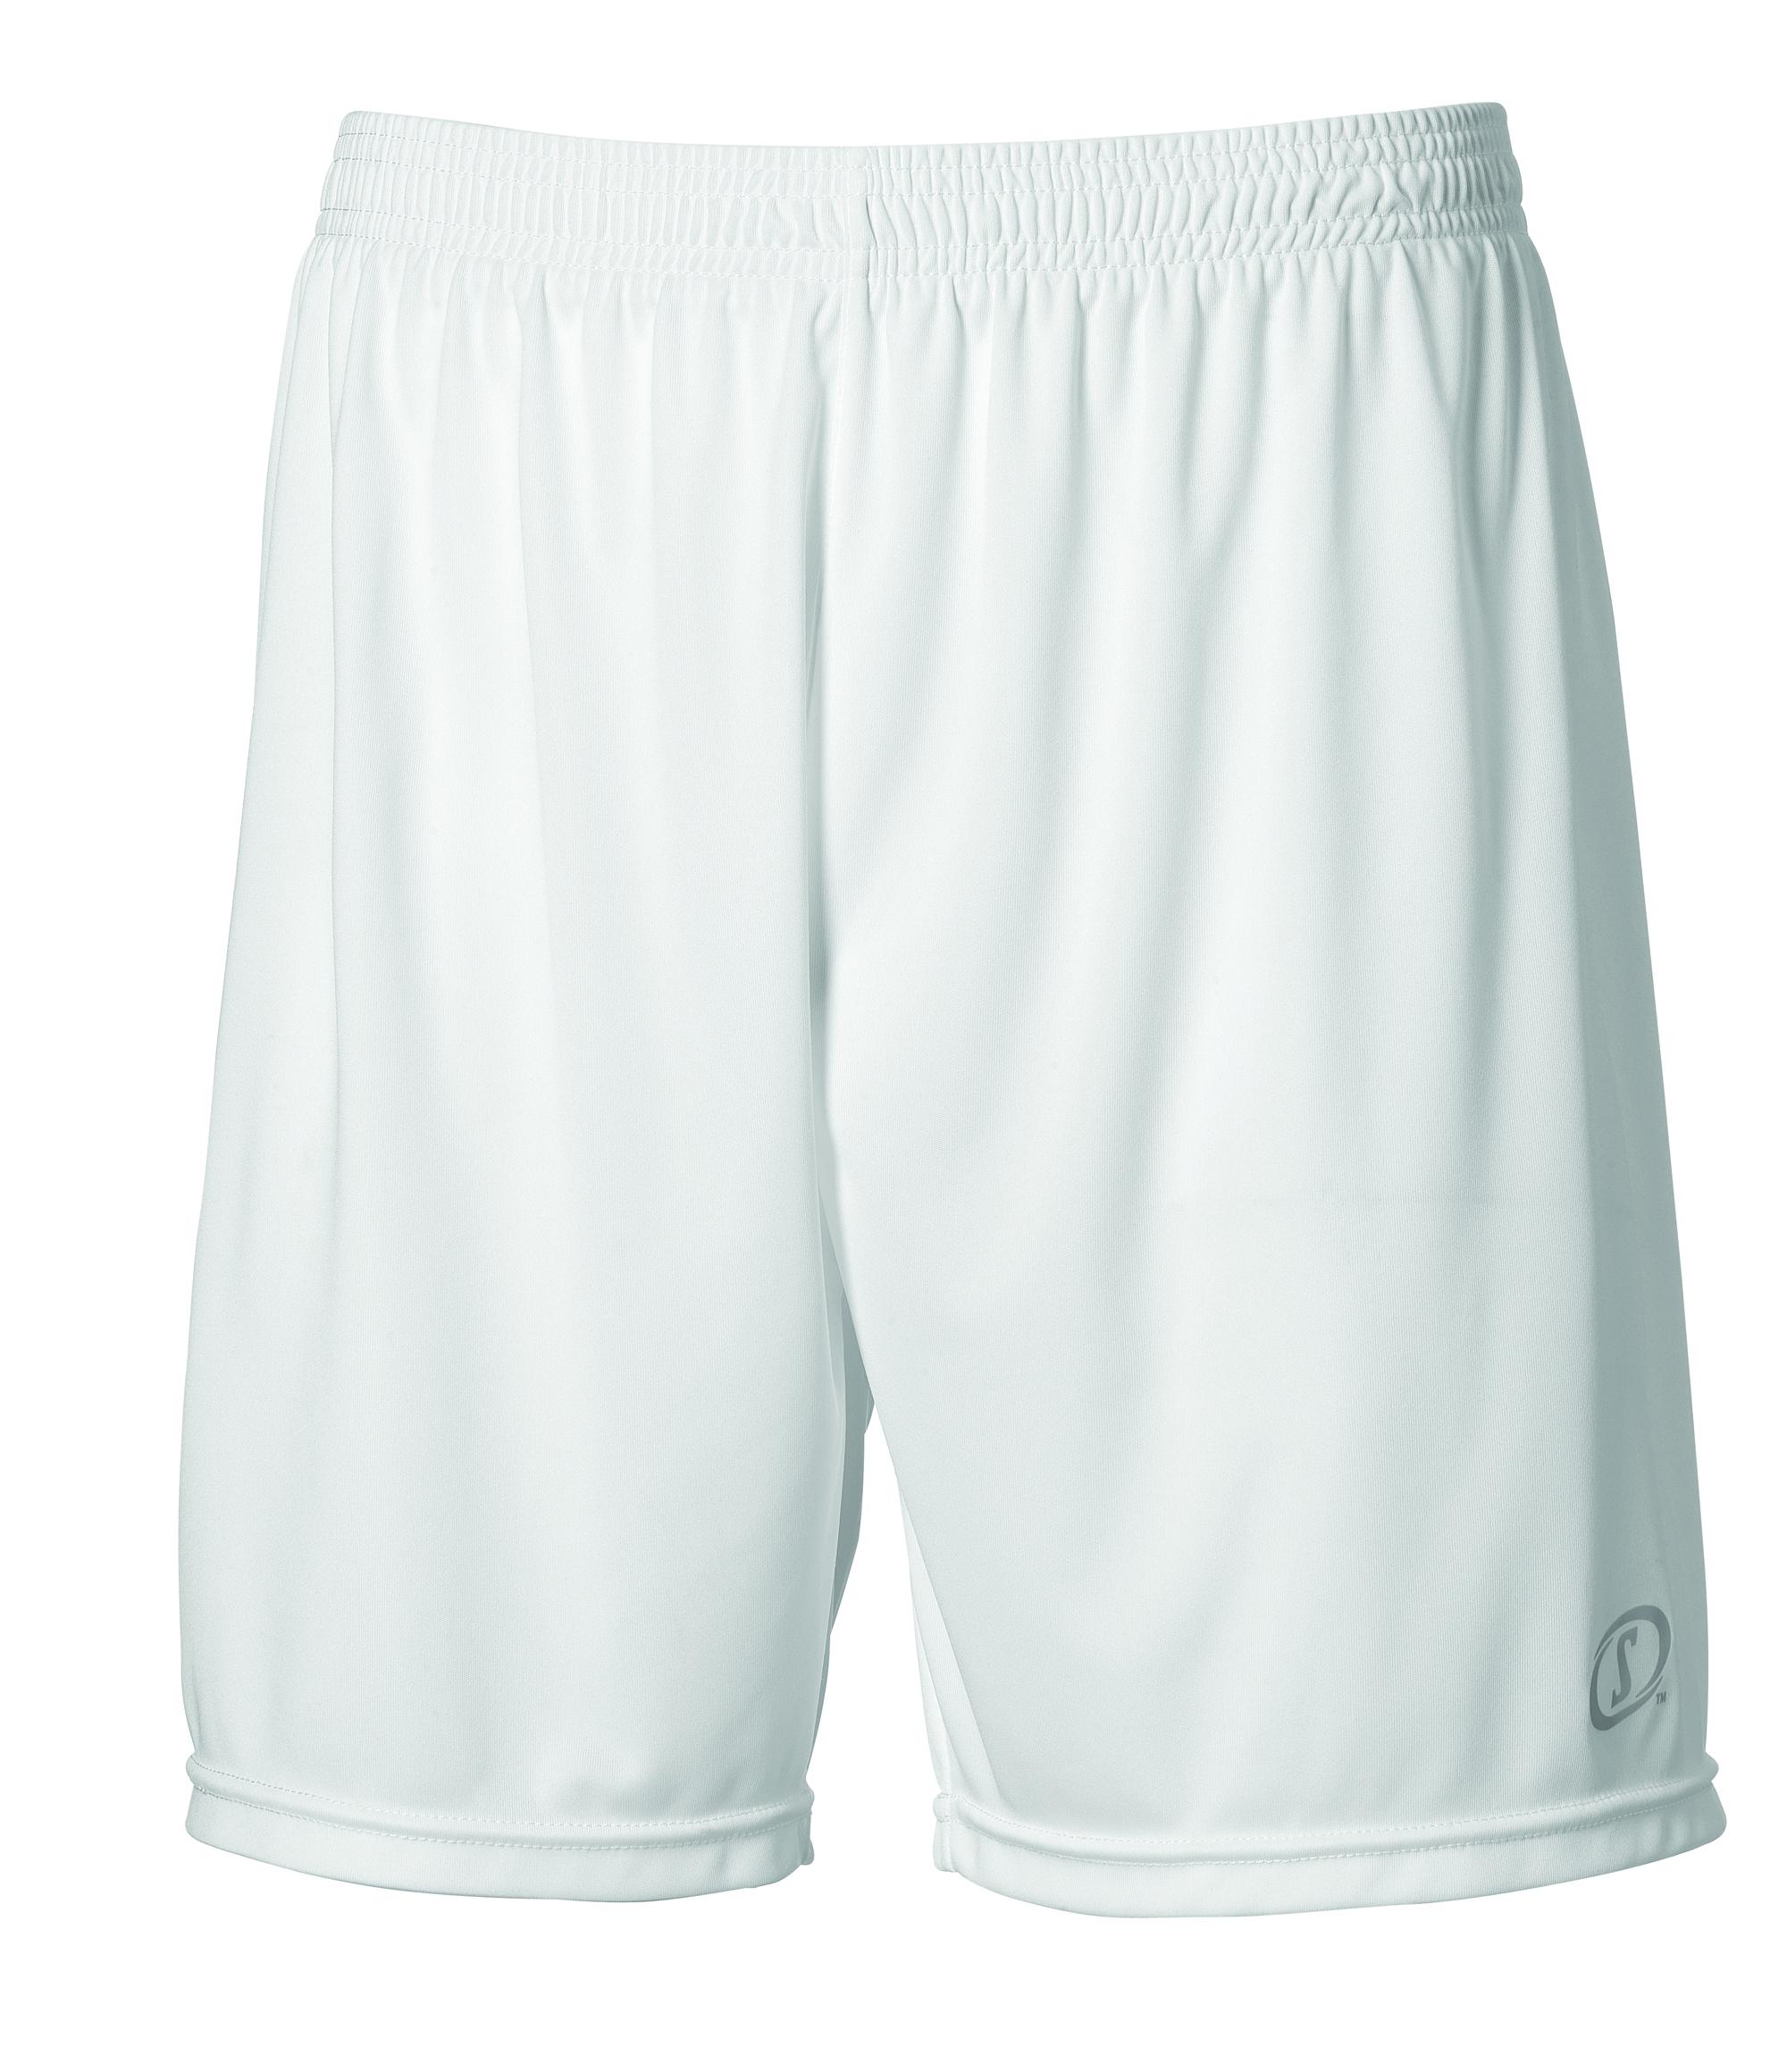 Core Training Shorts - White - S